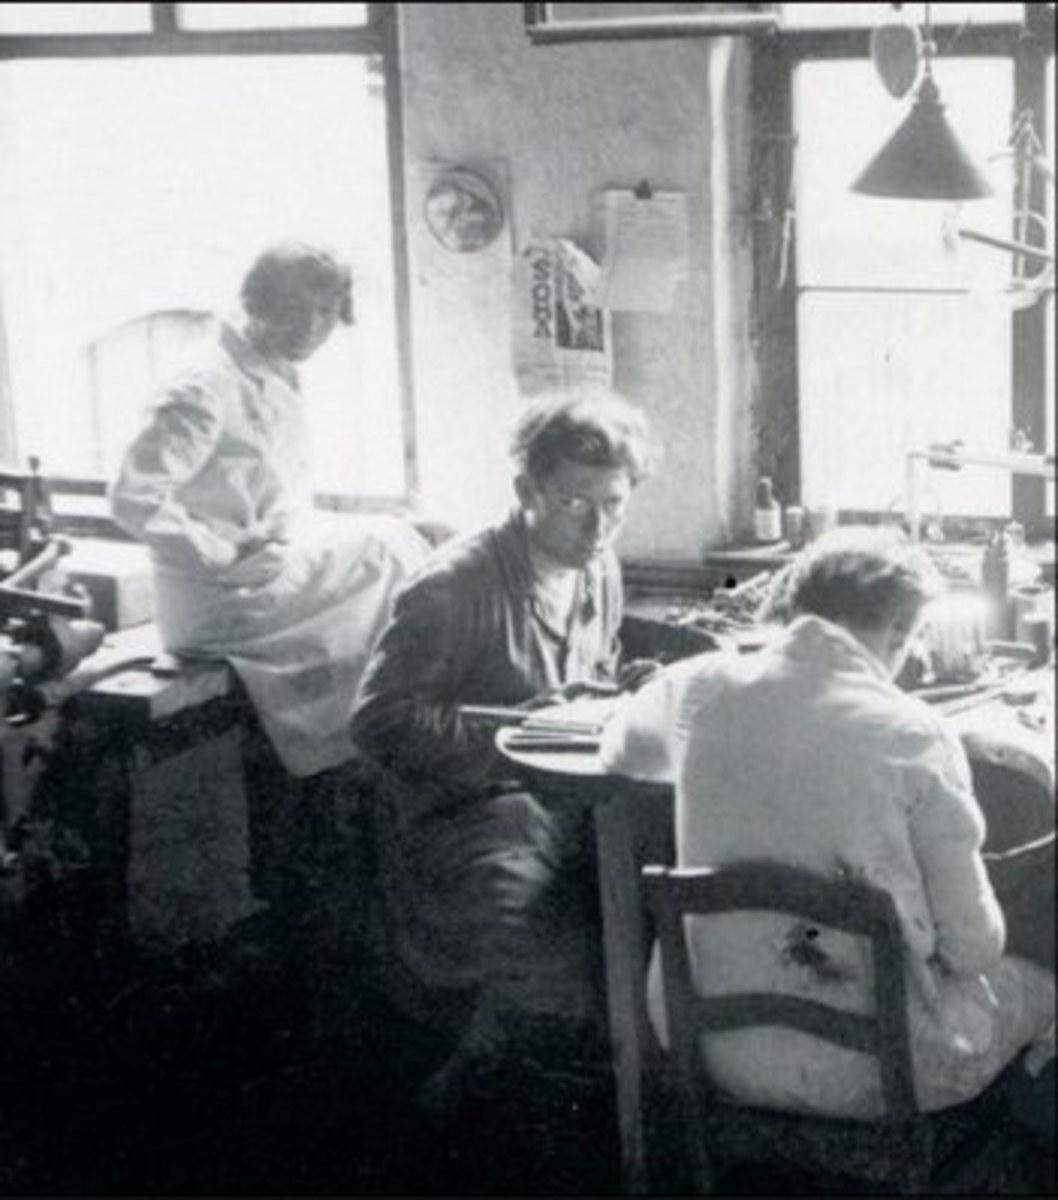 Marianne  and László Moholy Nagy at the Bauhaus Schools's metal workshop.